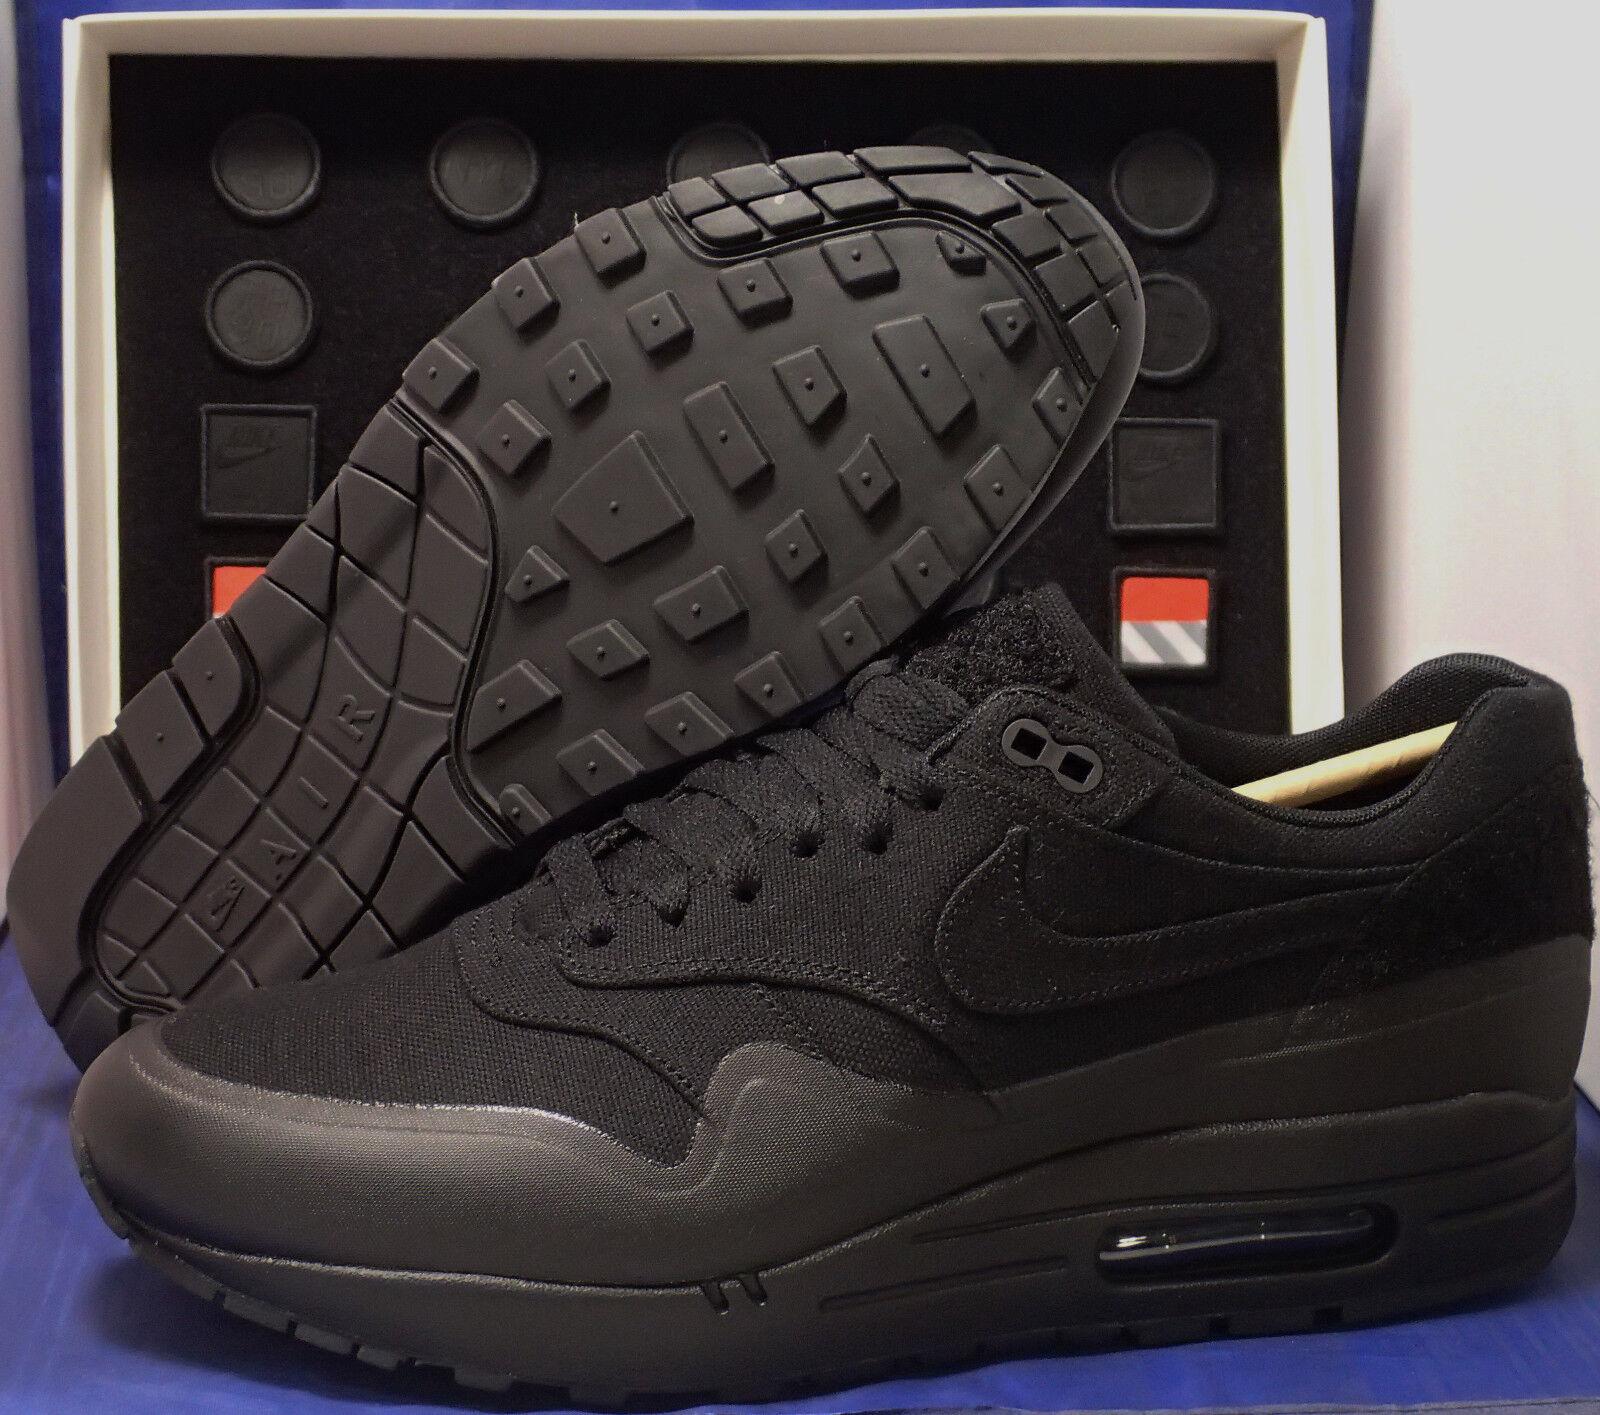 Nike Air Max 1 V SP Patch Black NikeLab USA Price reduction Brand discount